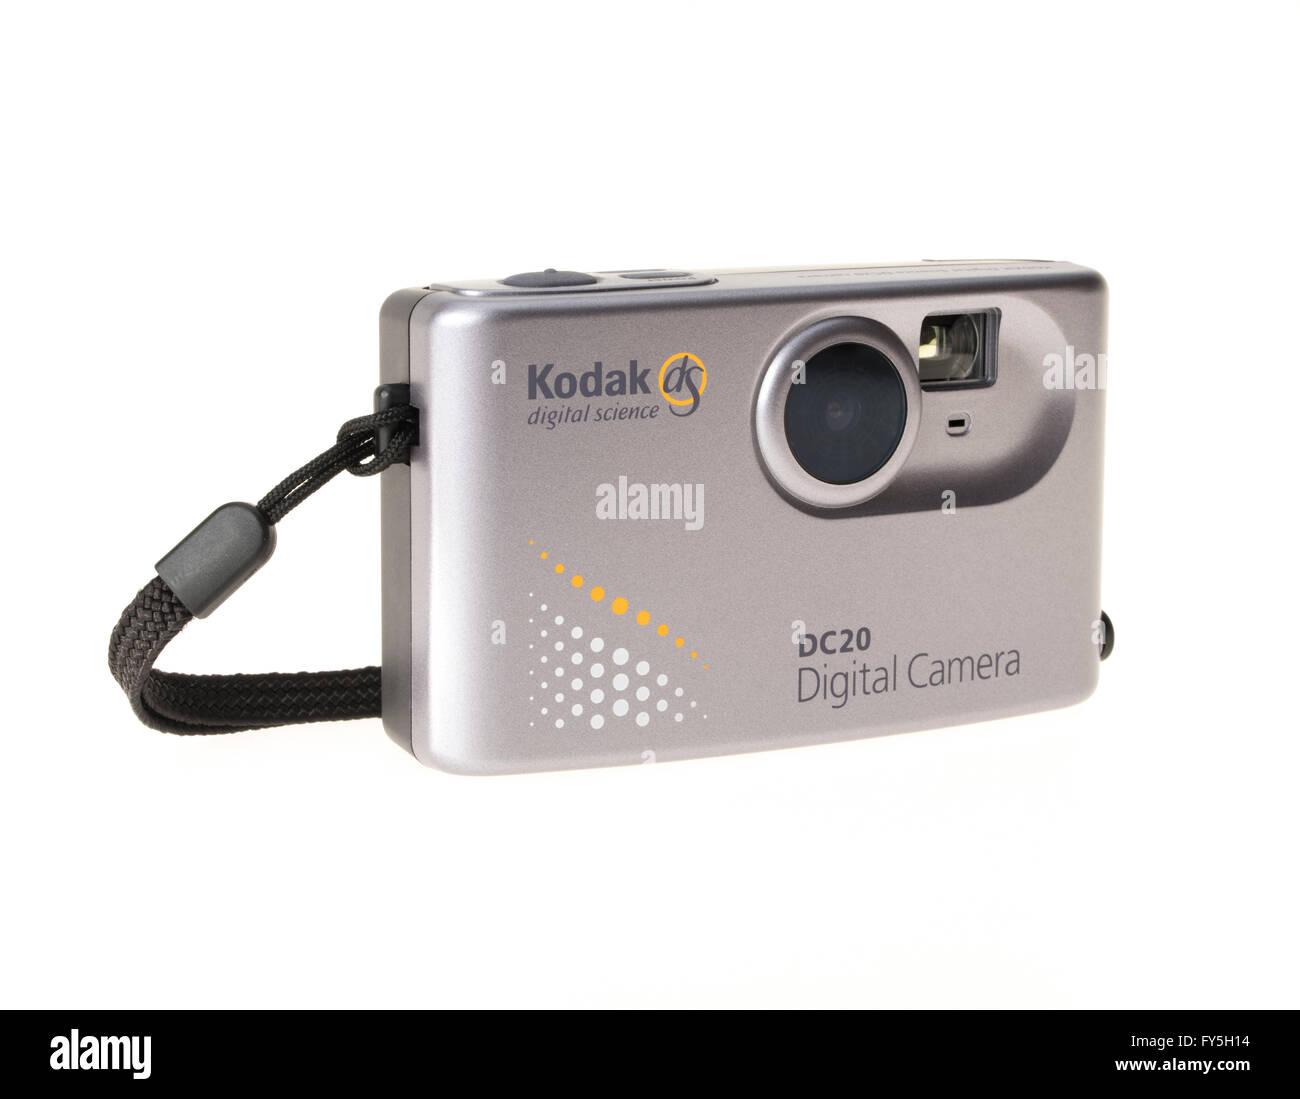 Kodak dS digital science DC20 digital camera released by